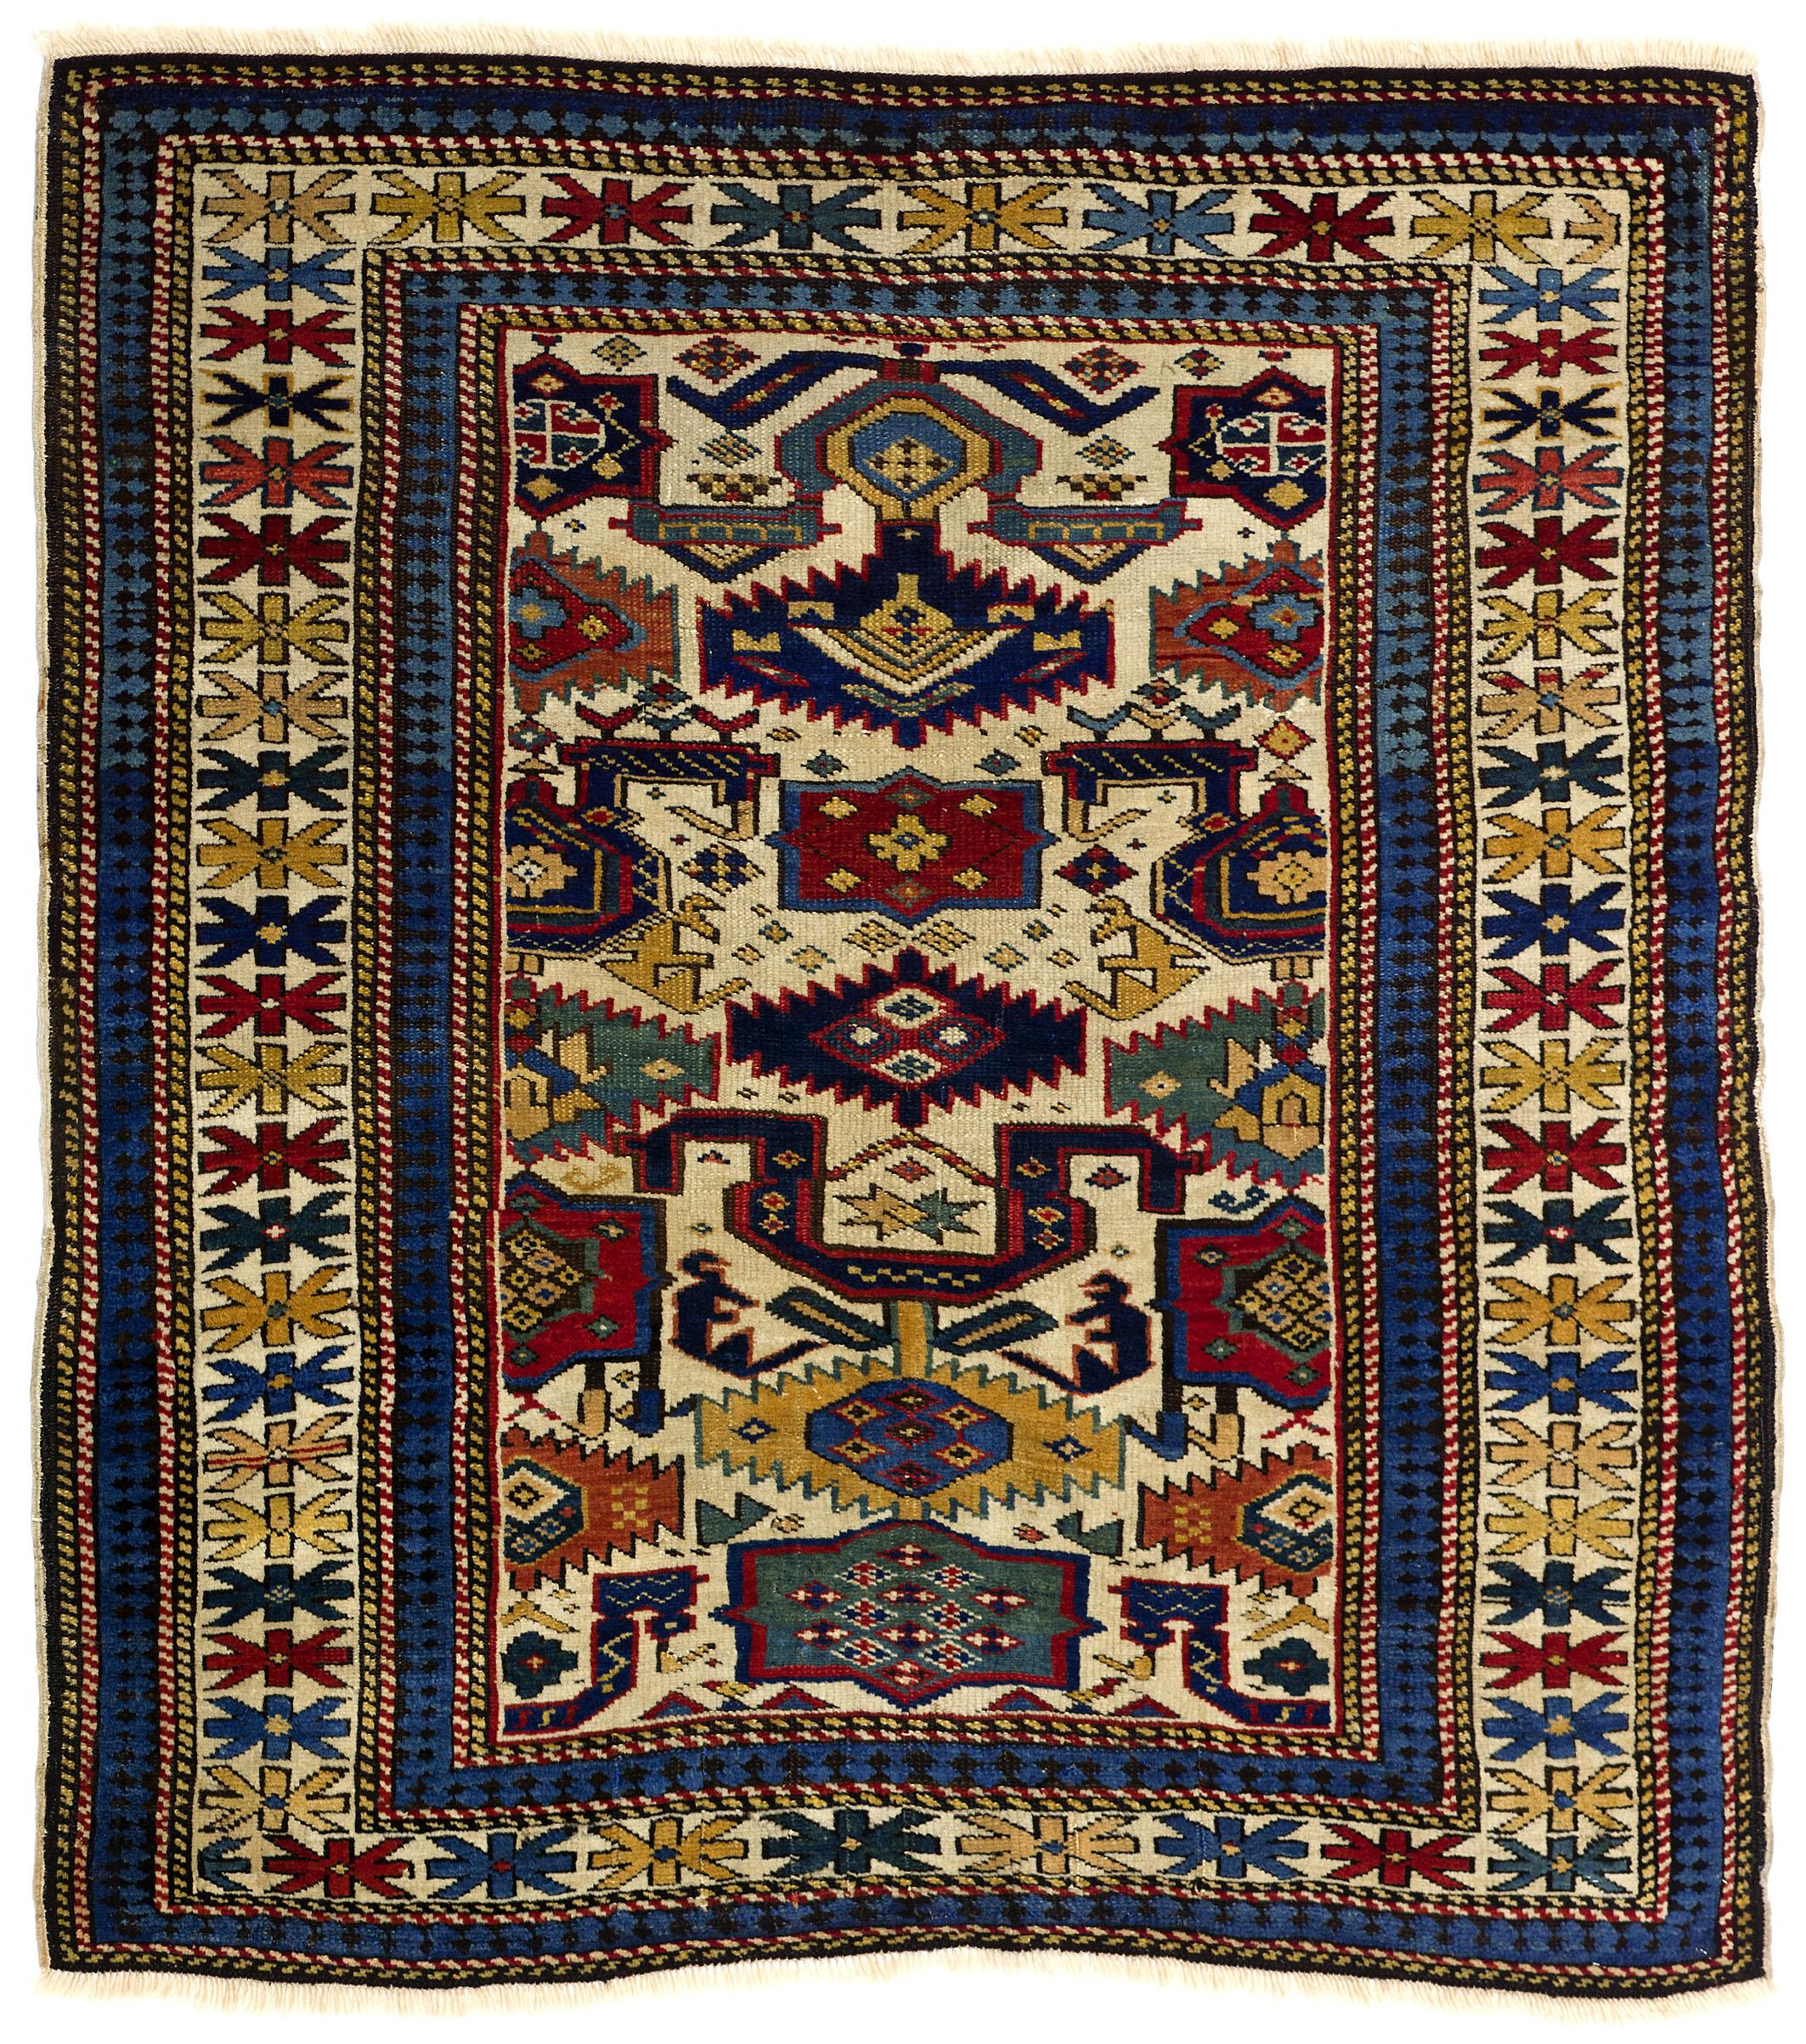 Kuba or Shirvan rug, northeast Caucasus, 19th century. 110 x 114cm. Teppichhaus Lerch, Munich